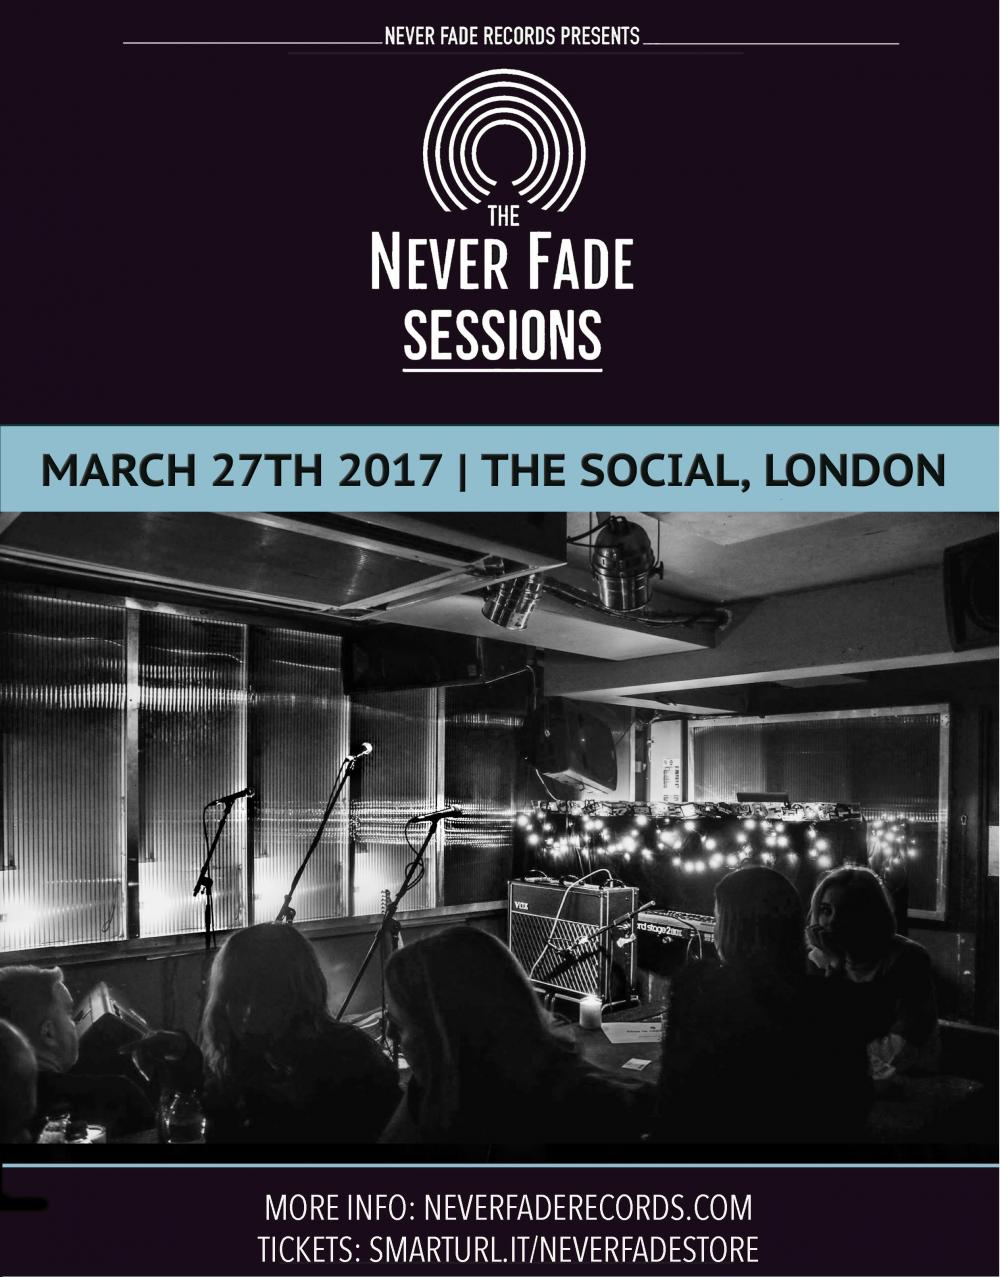 Never Fade - March 27th